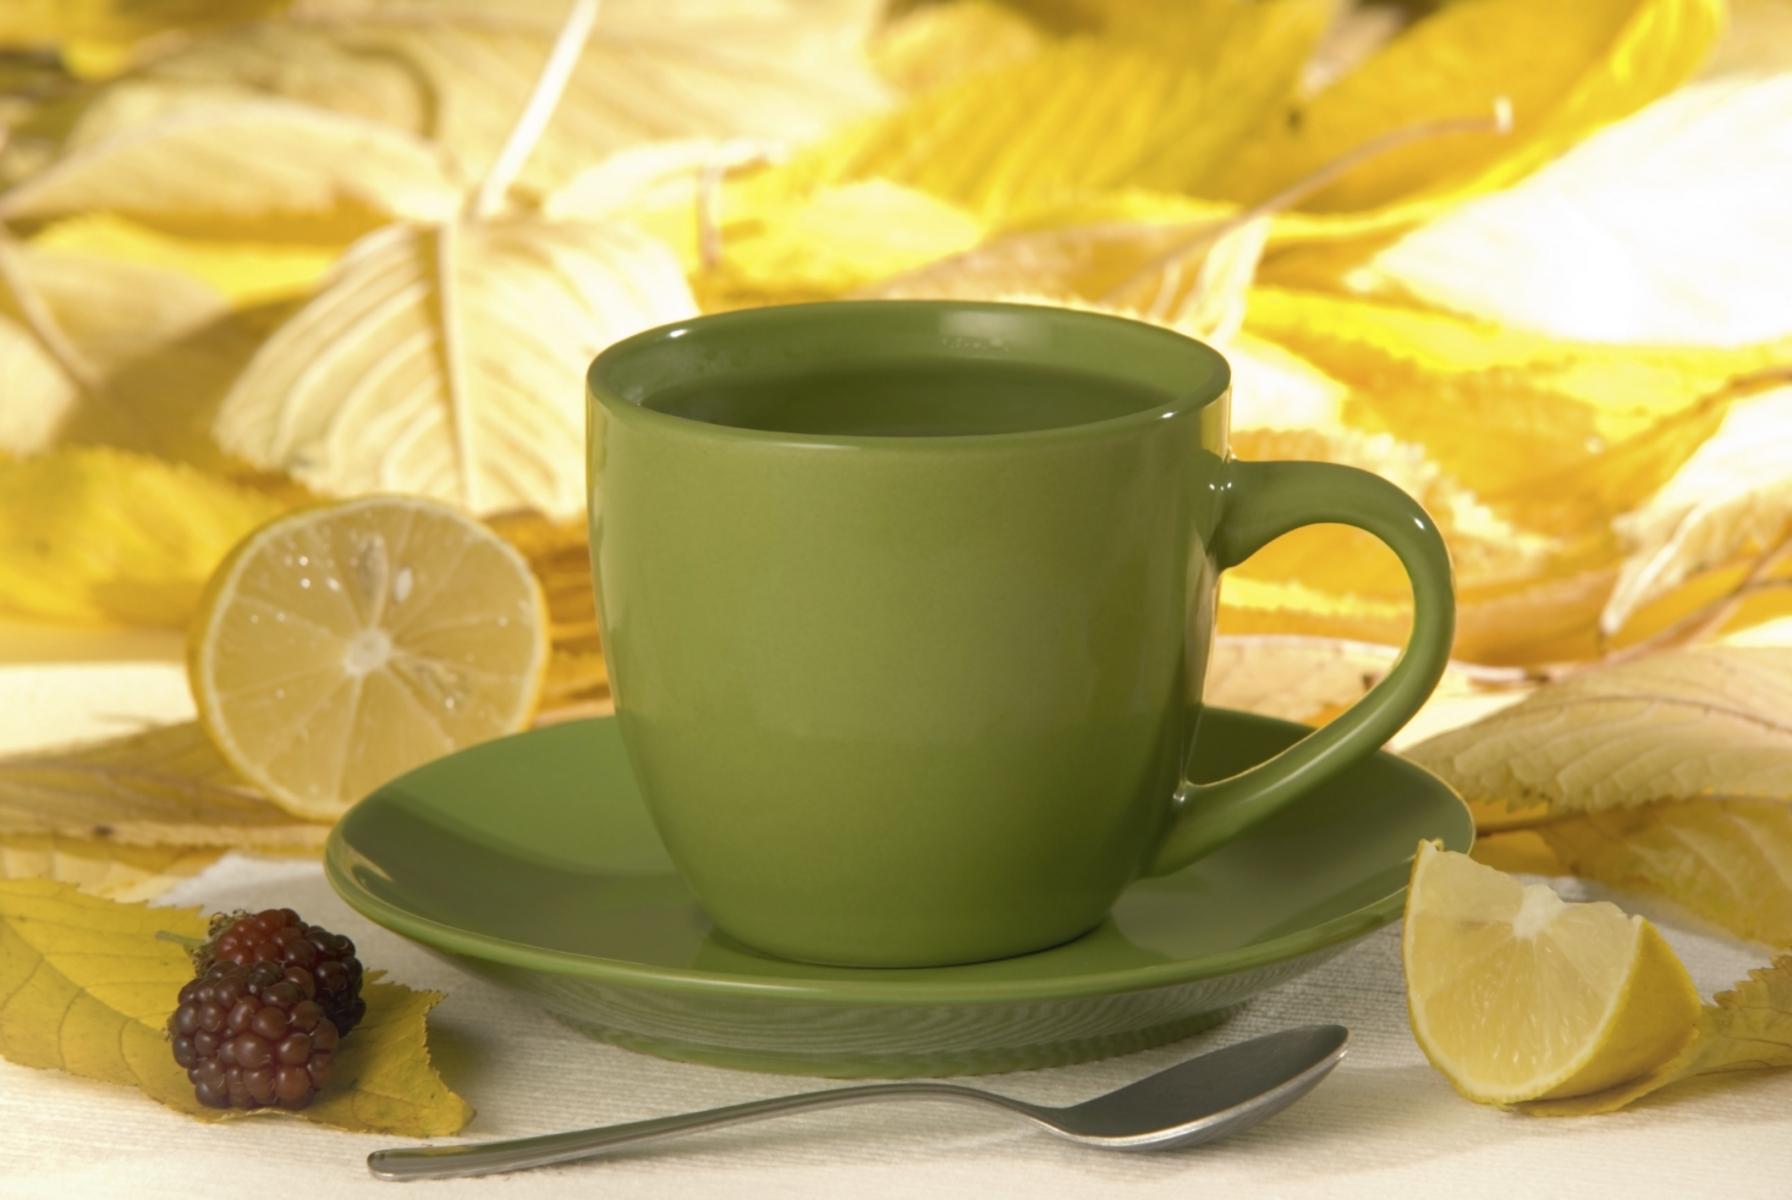 Resultado de imagen para agua caliente con limon